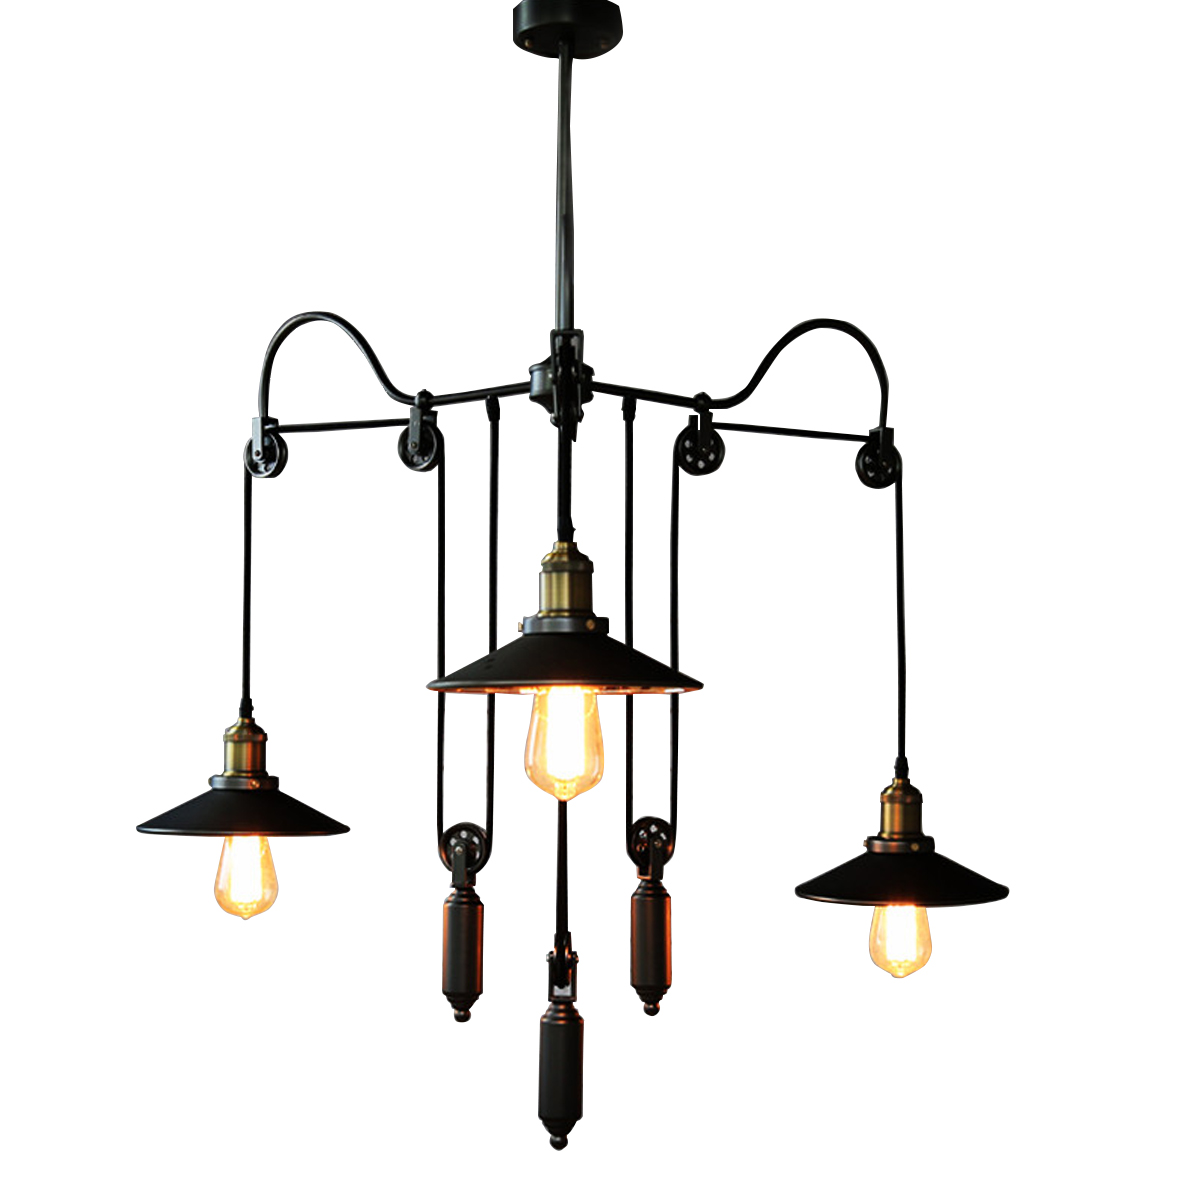 Modern Nordic Village Industrial Style Pendant Lamp Adjustable Pendant Light Telescopic Personality Lamps Cafe Lamp Levodecor(China (Mainland))